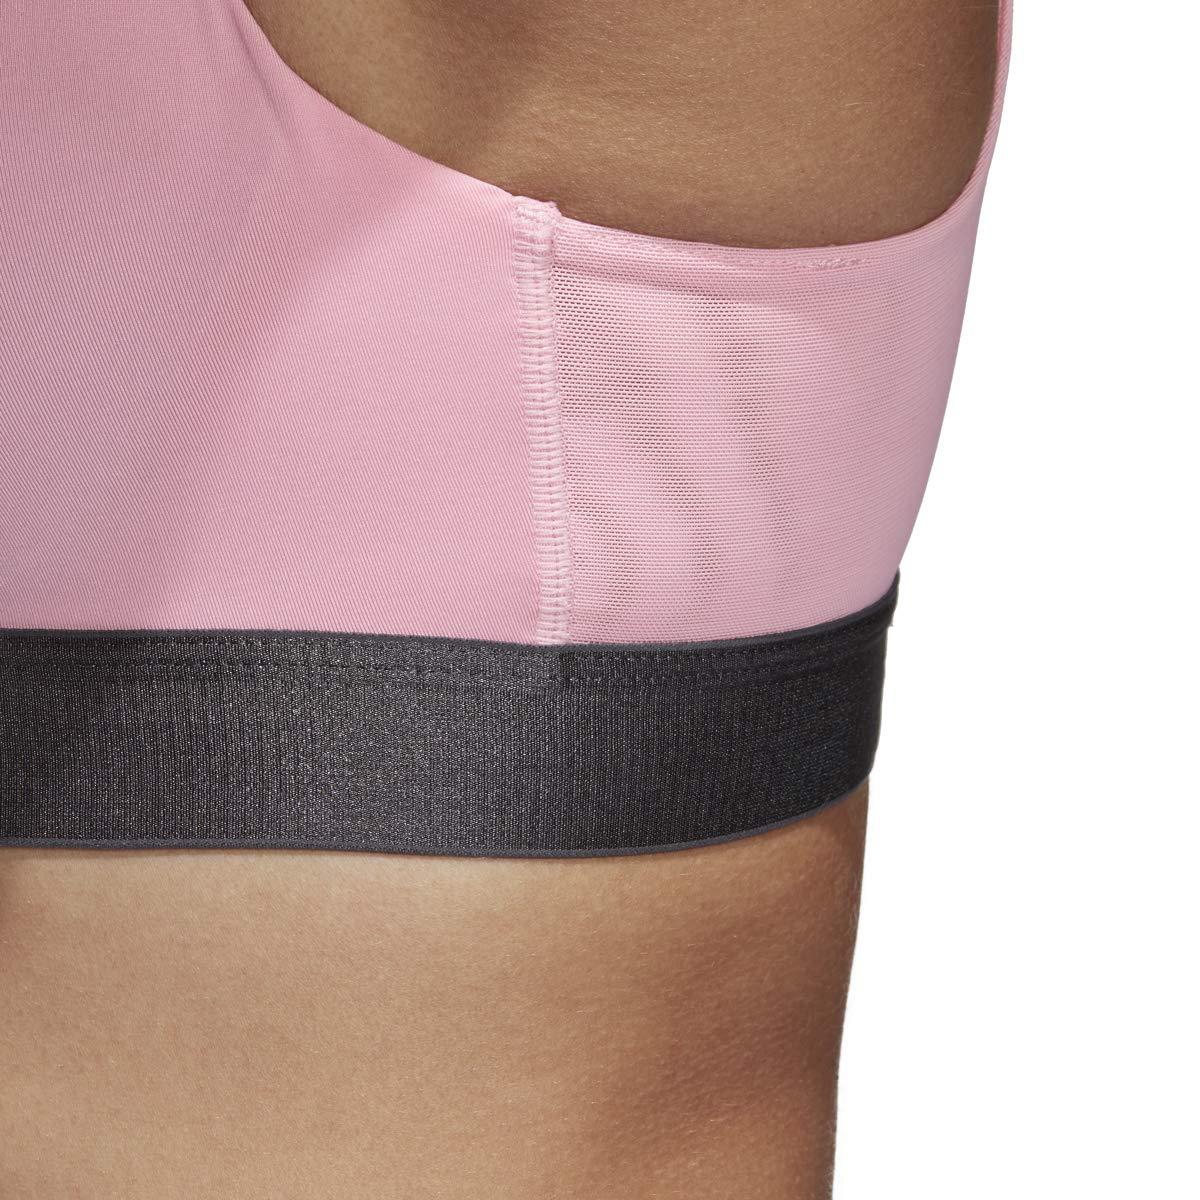 adidas Stronger for IT Soft Bra, True Pink, 30B